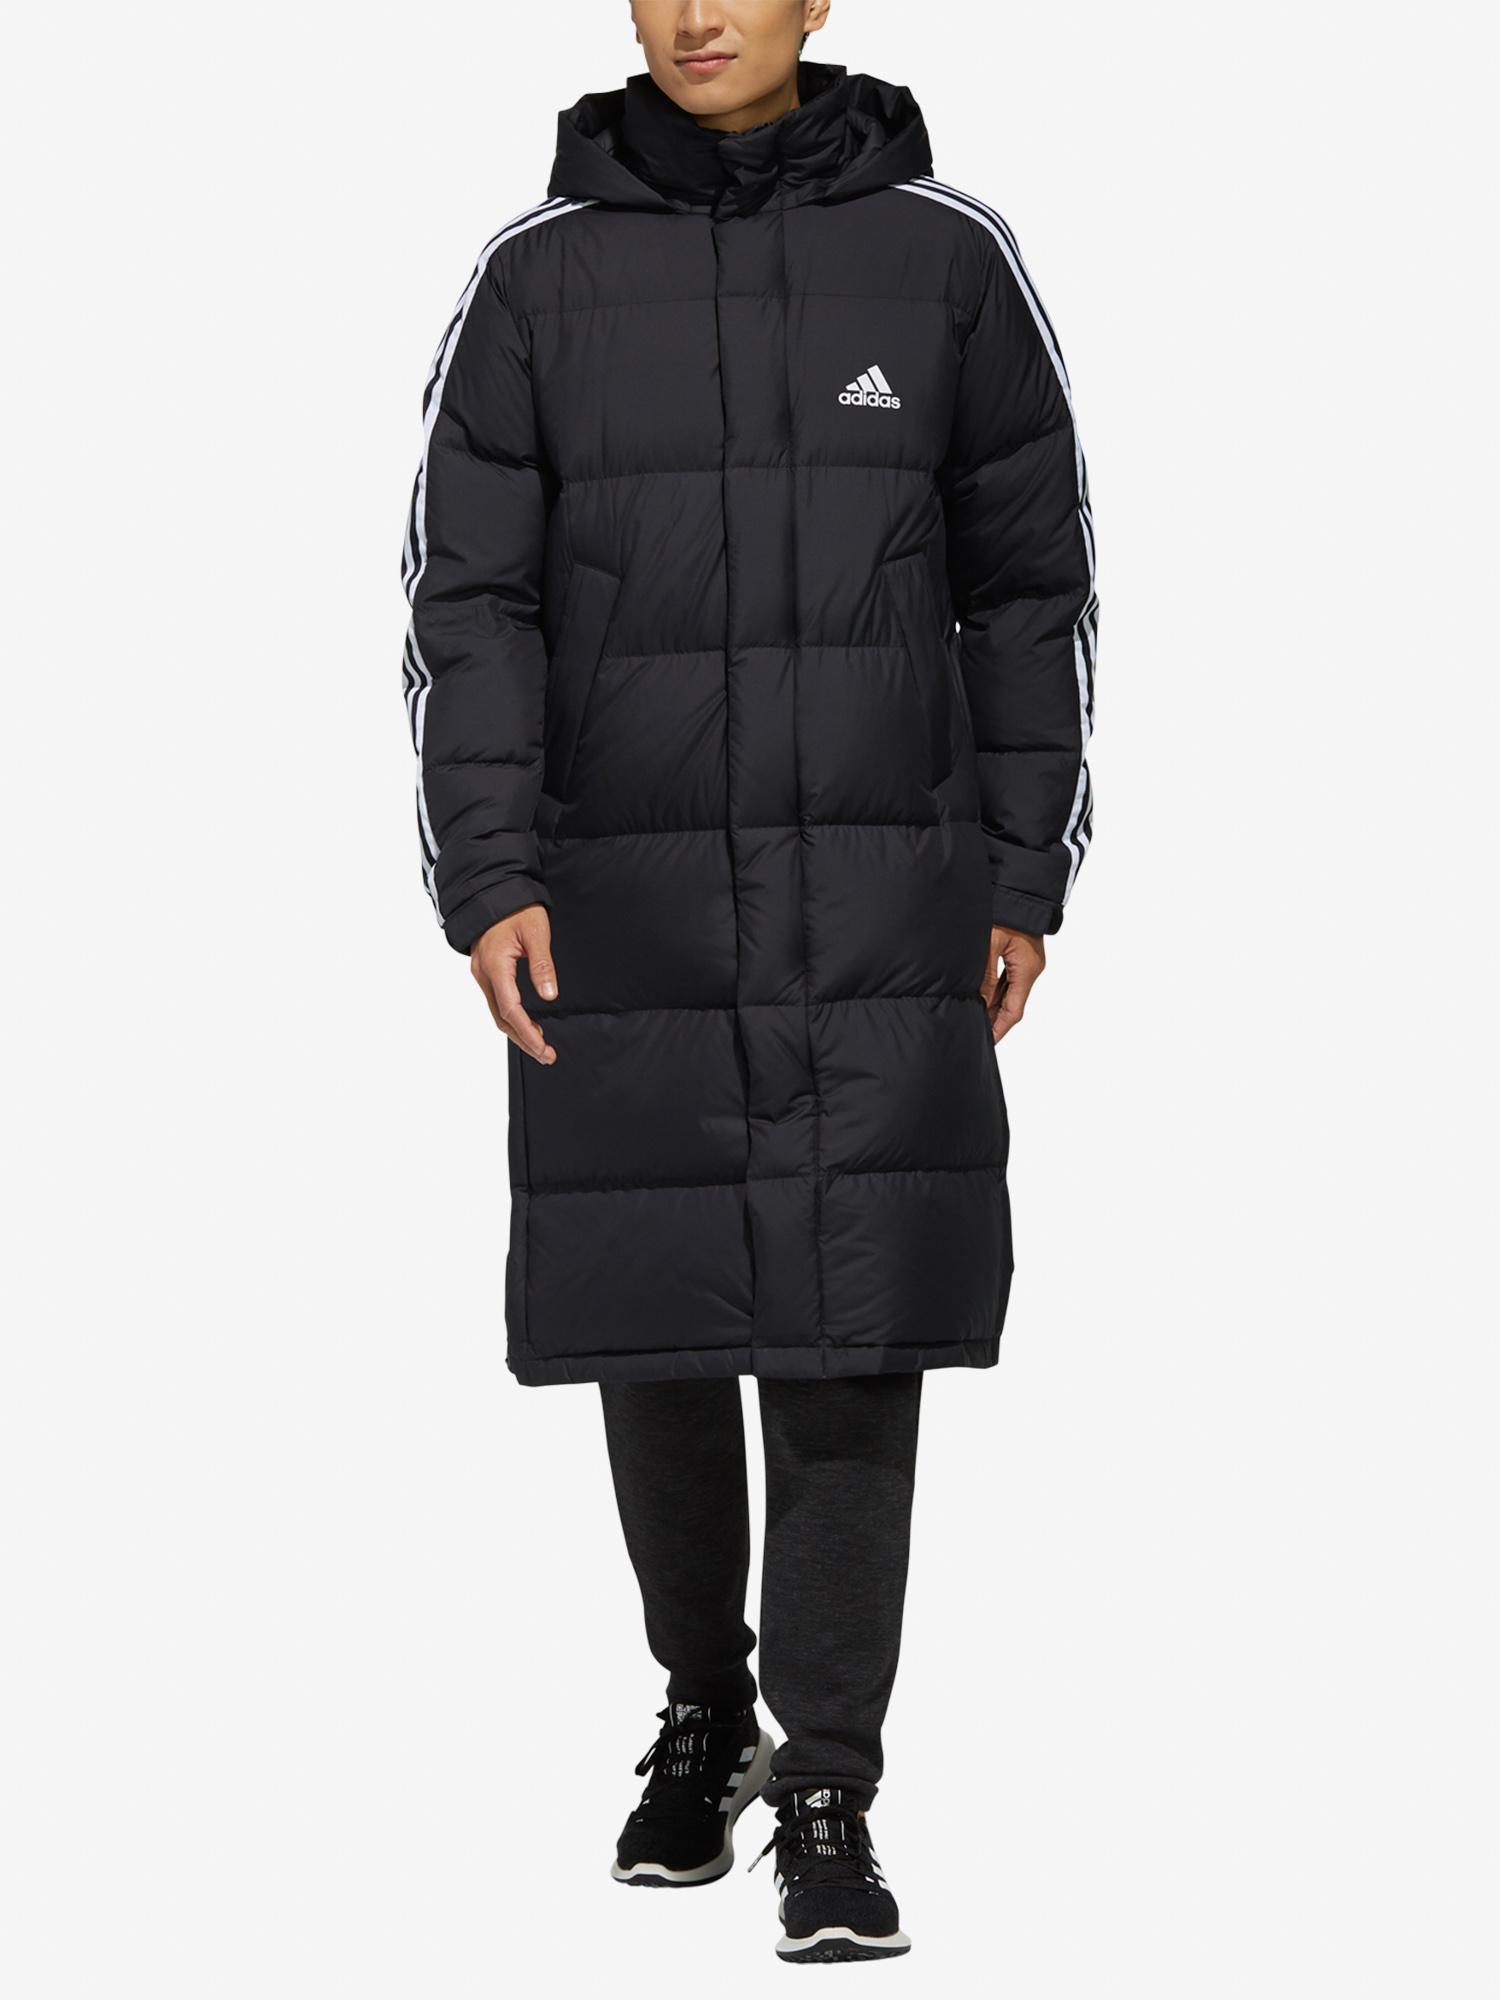 Adidas Performance 3St Long Parka Jacket